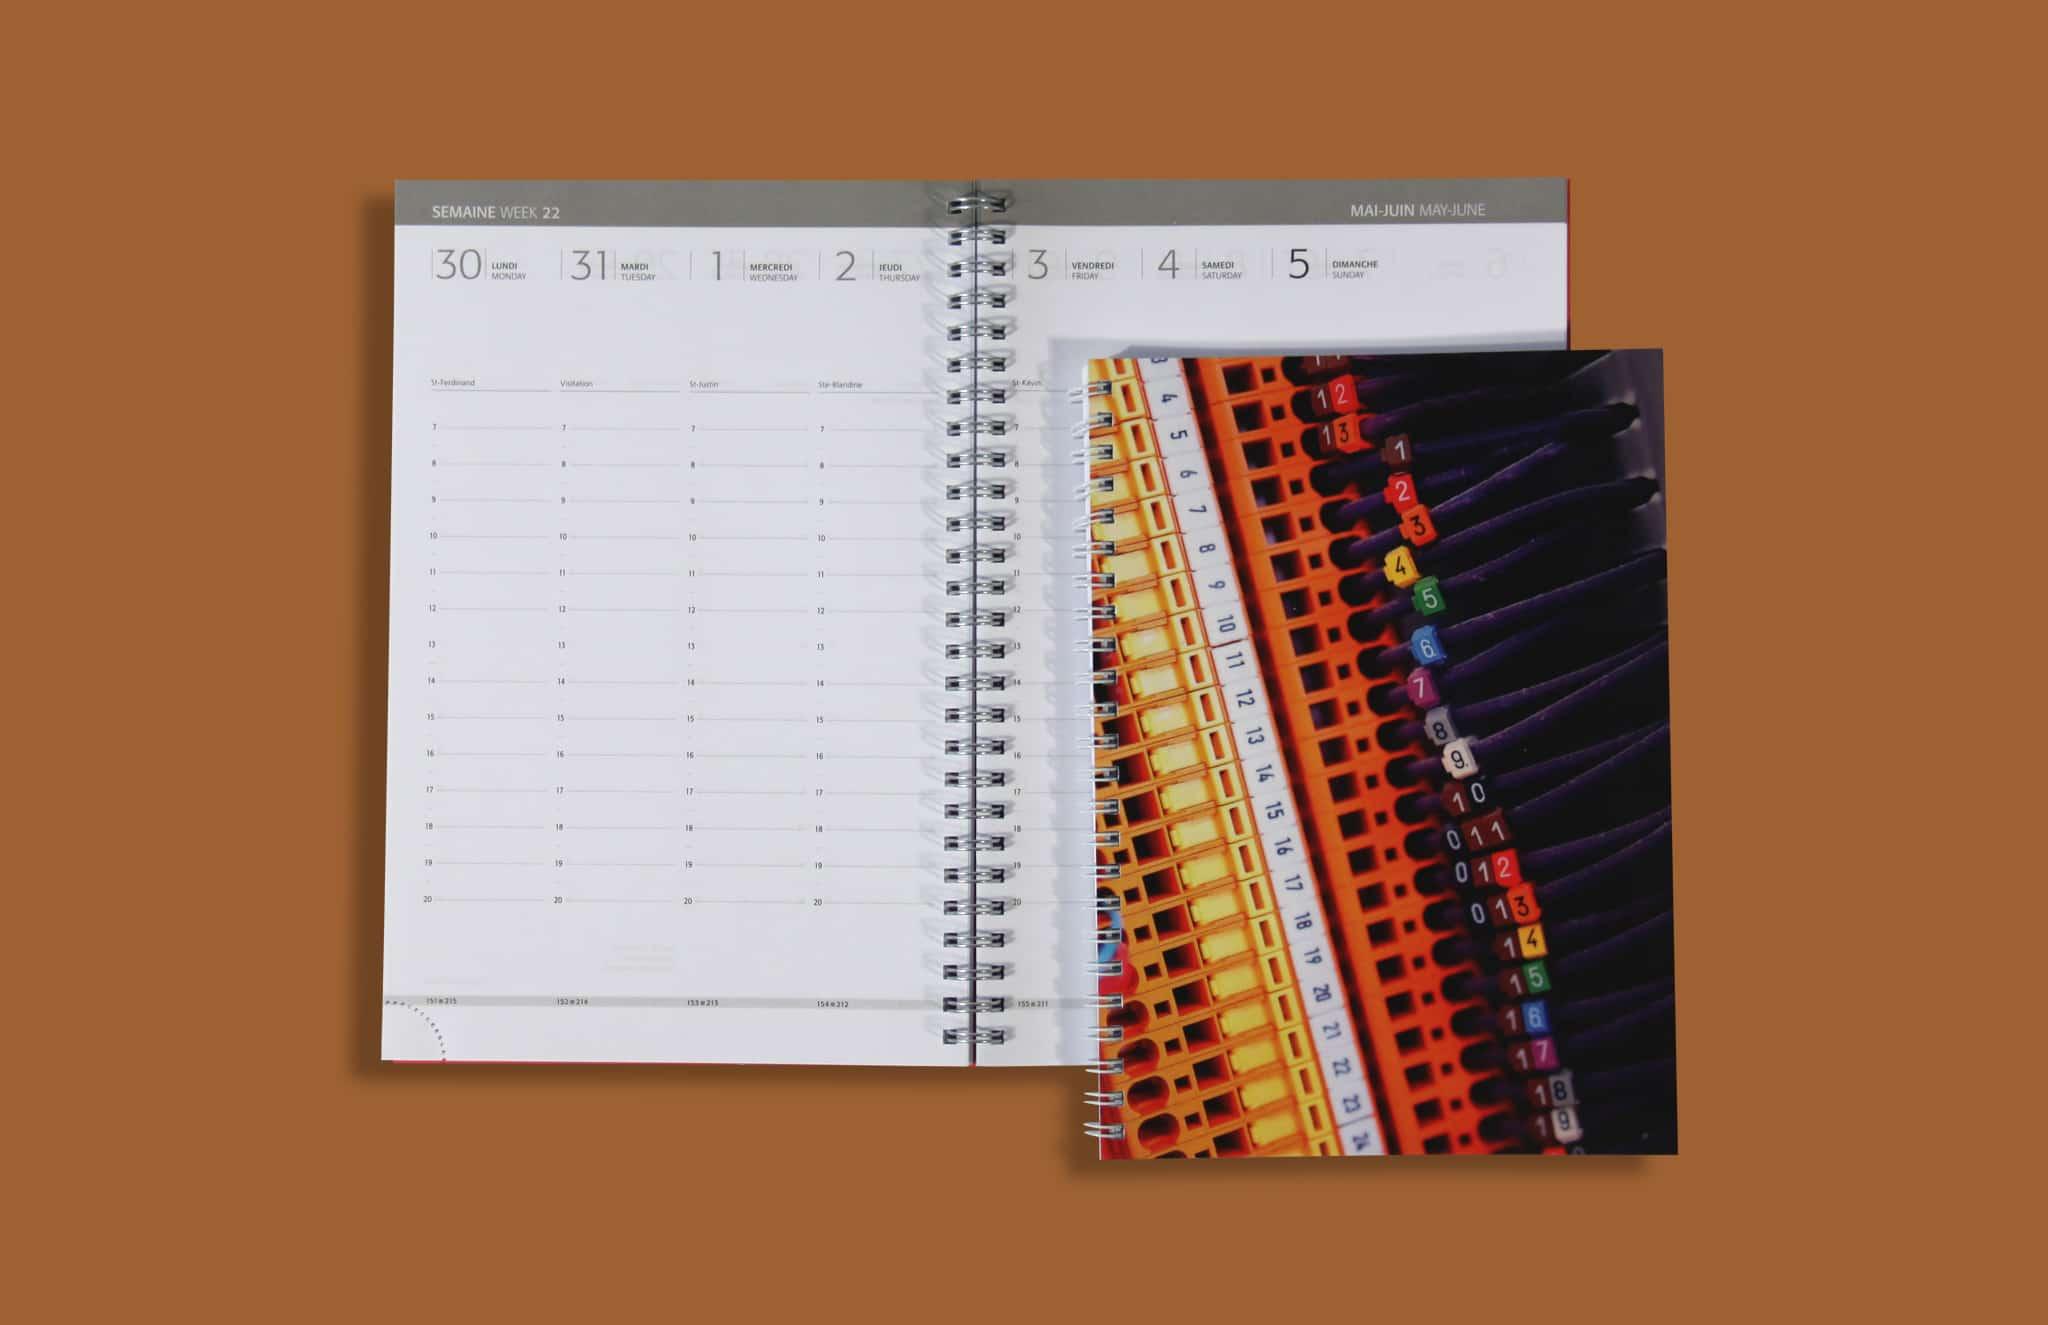 Agenda Bureau V24 Couverture Imprimee Reliure Spirale